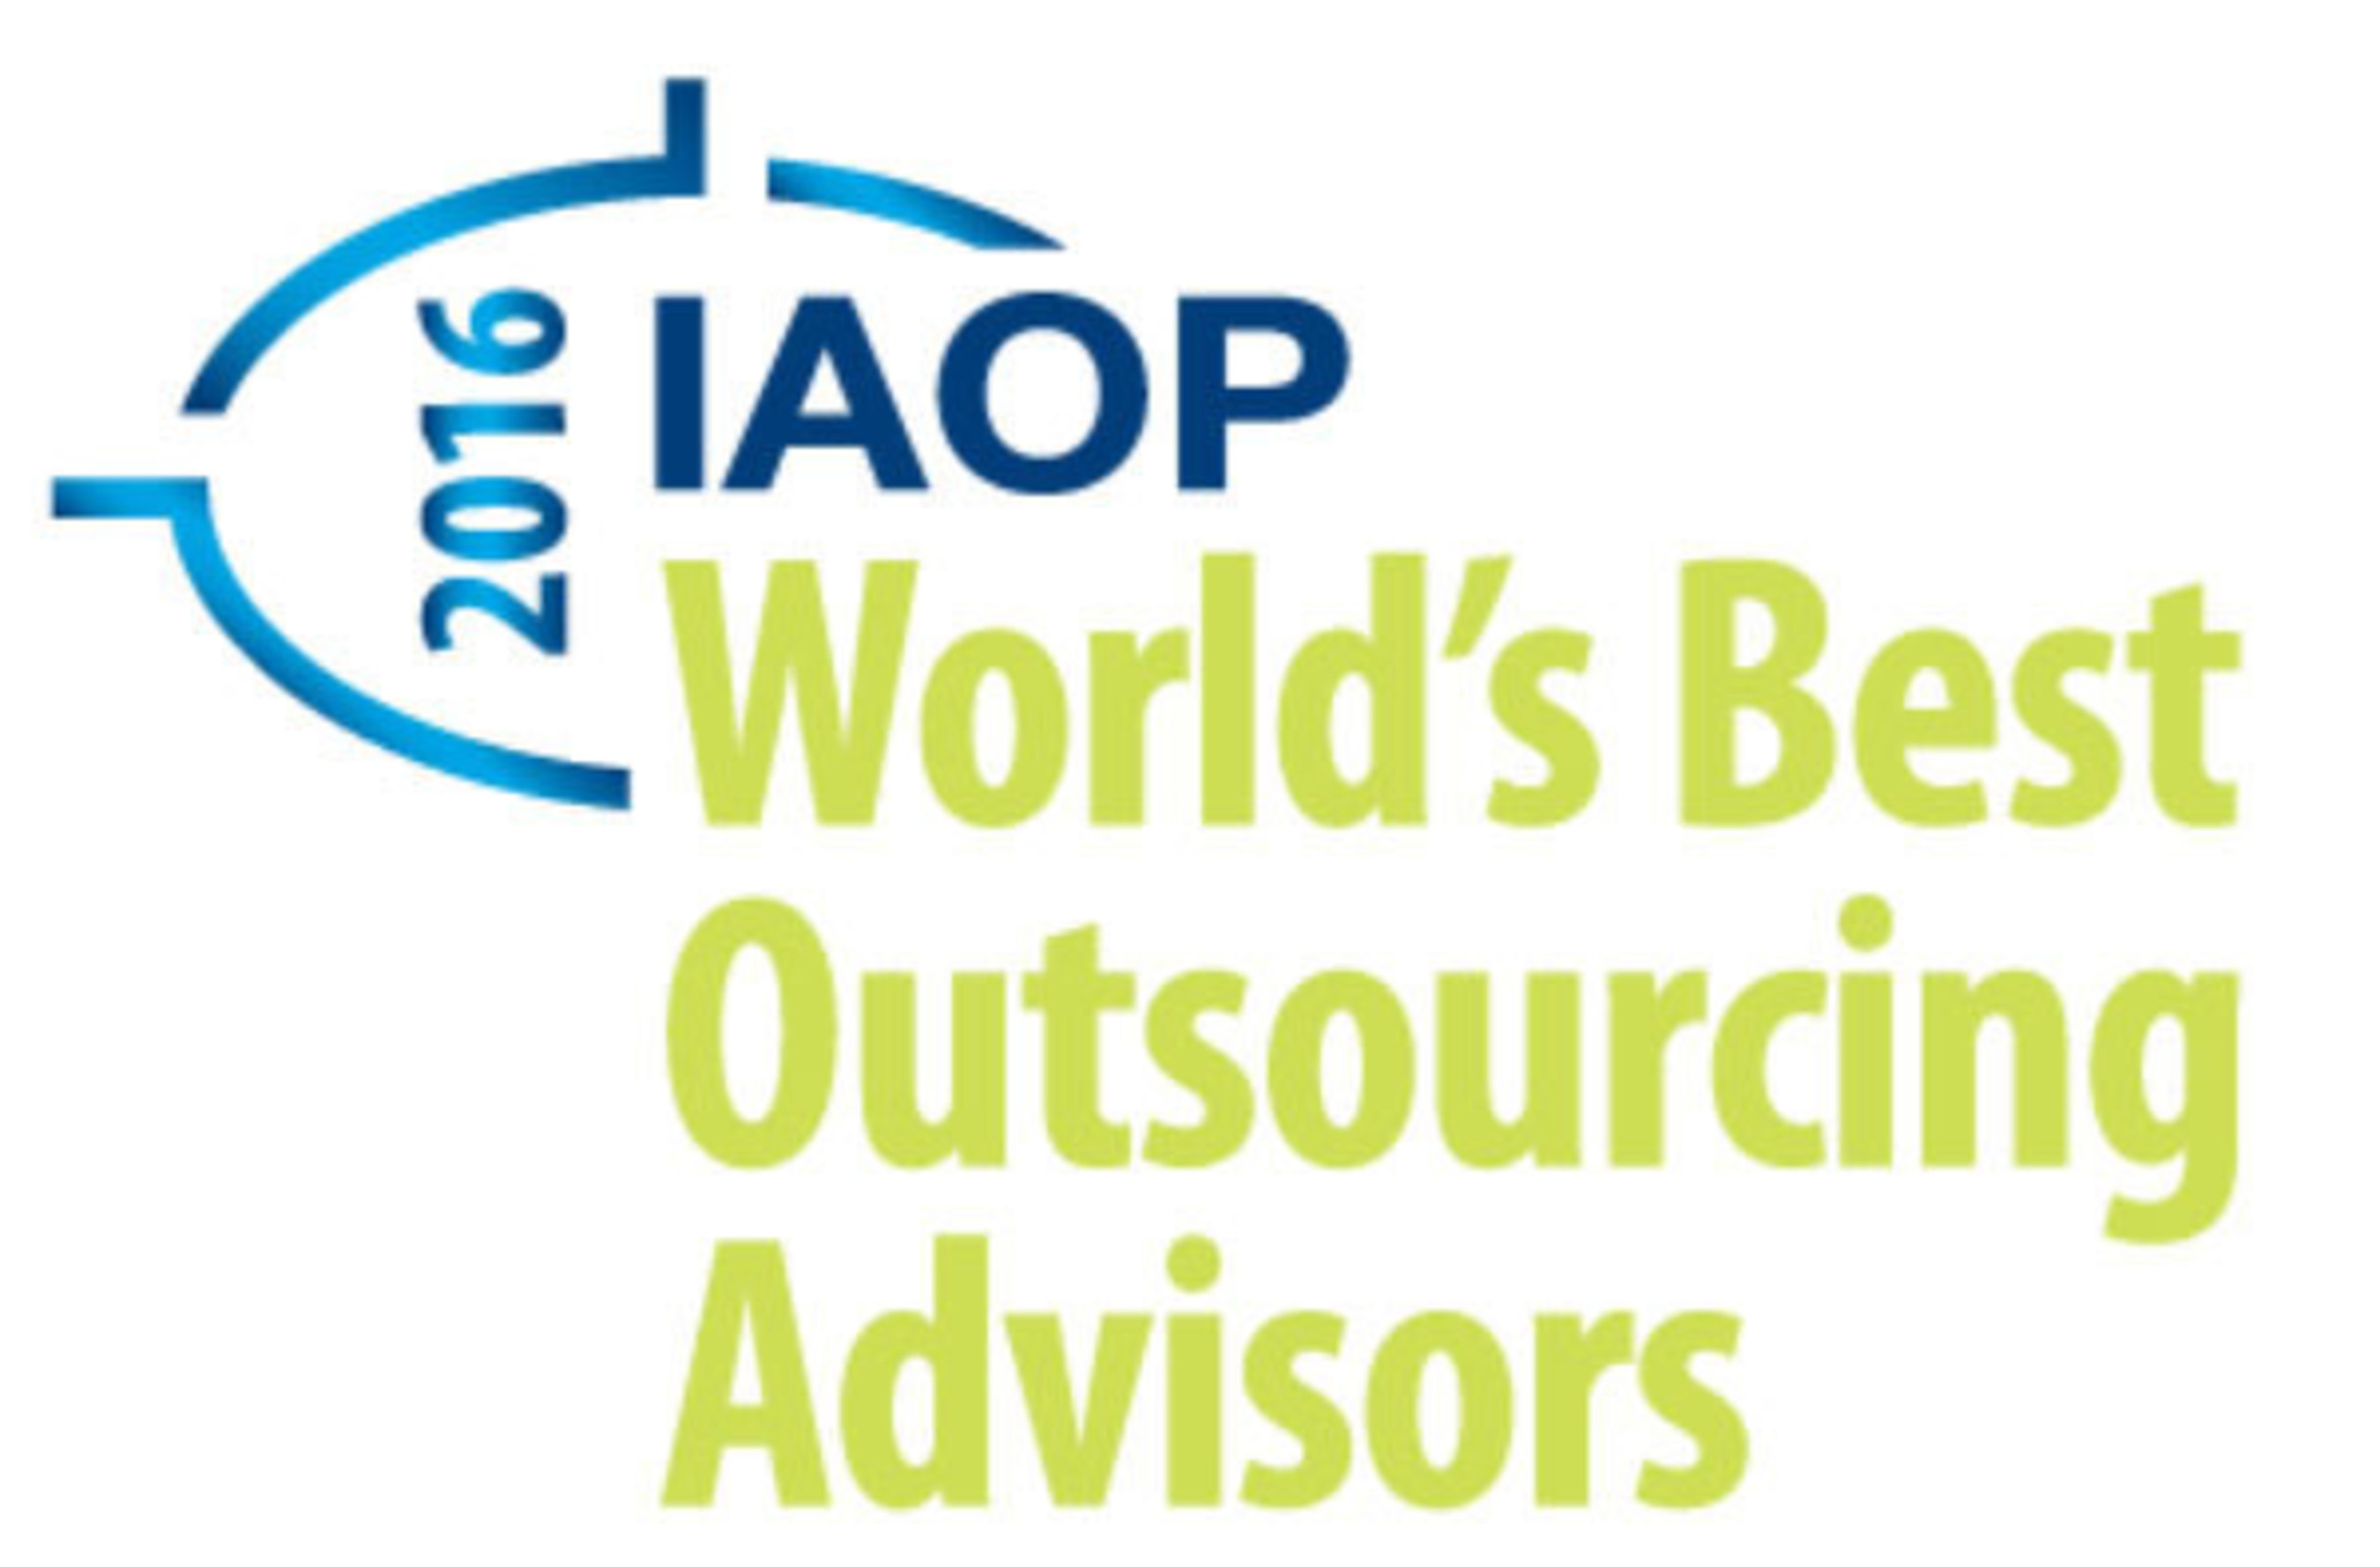 IAOP Word's Best Outsourcing Advisors.